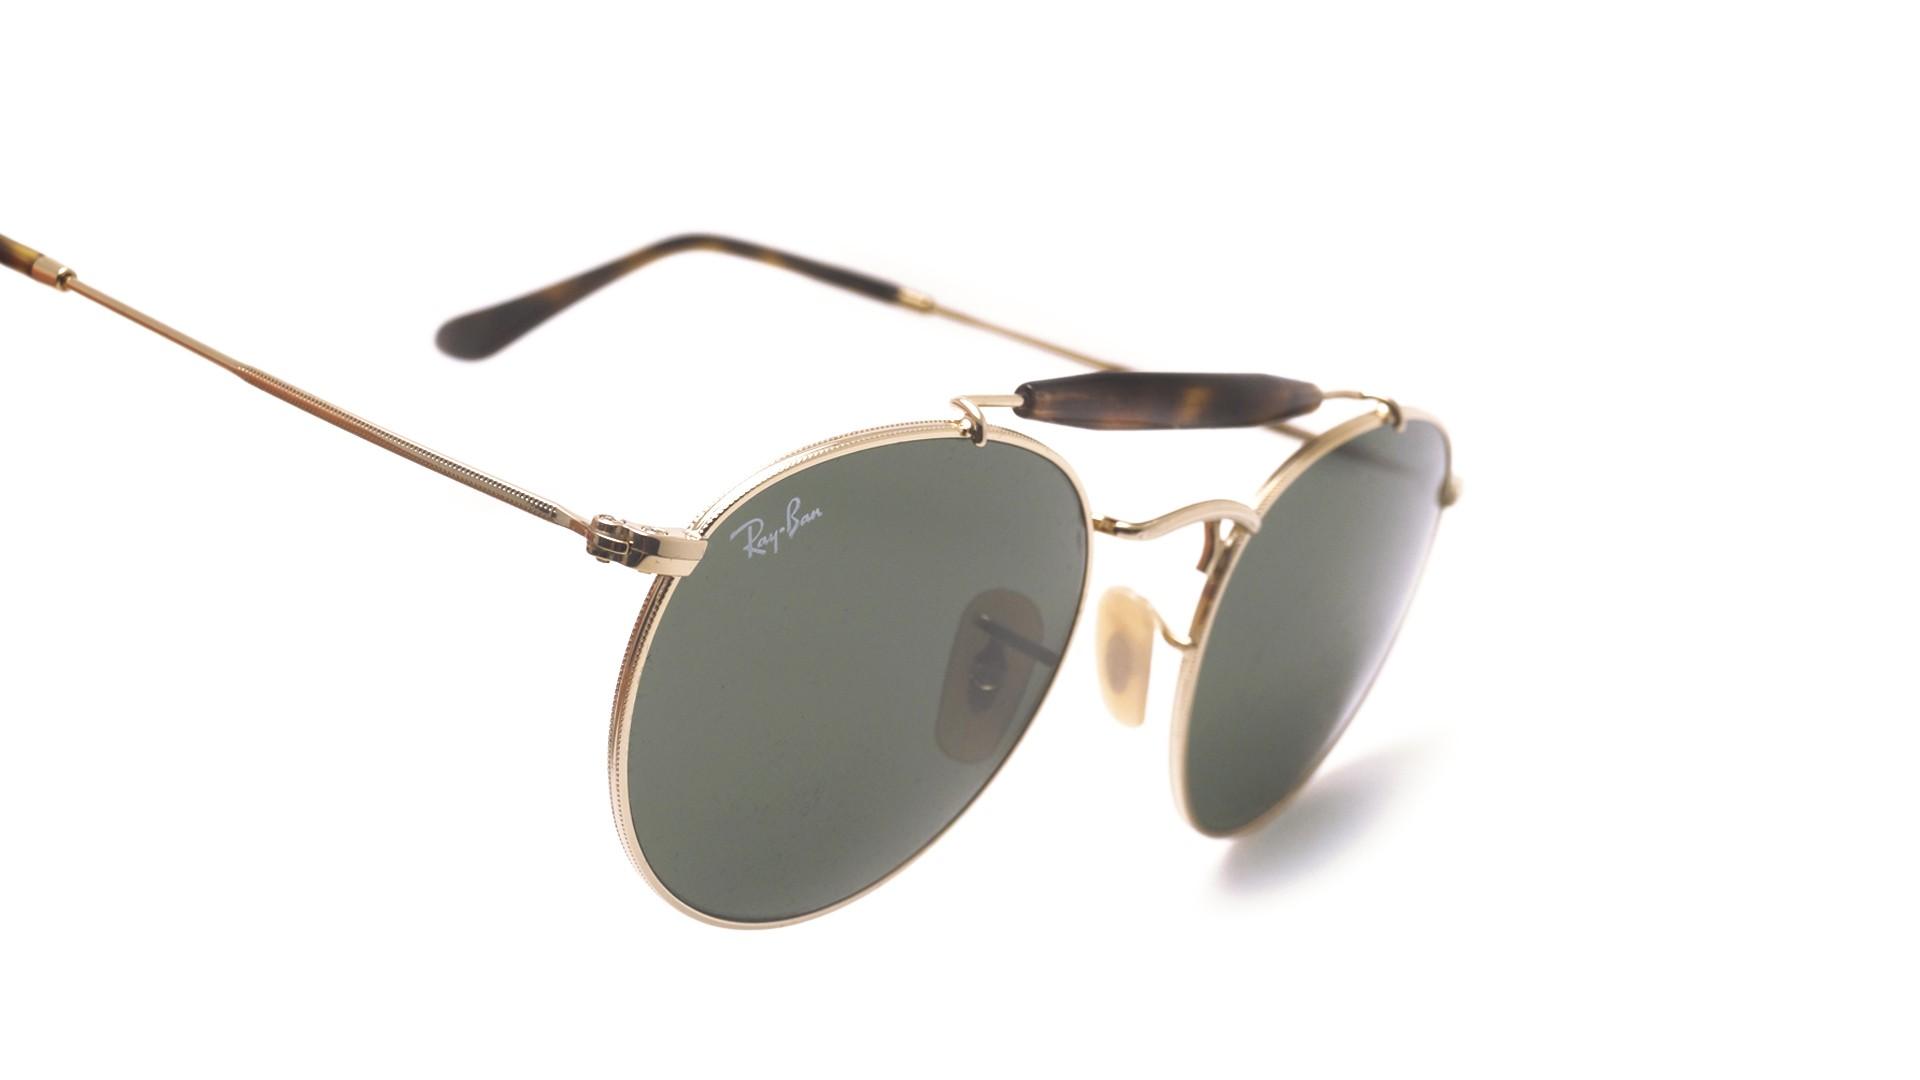 7675eb9c7e Sunglasses Ray-Ban RB3747 001 50-21 Gold G-15 Medium